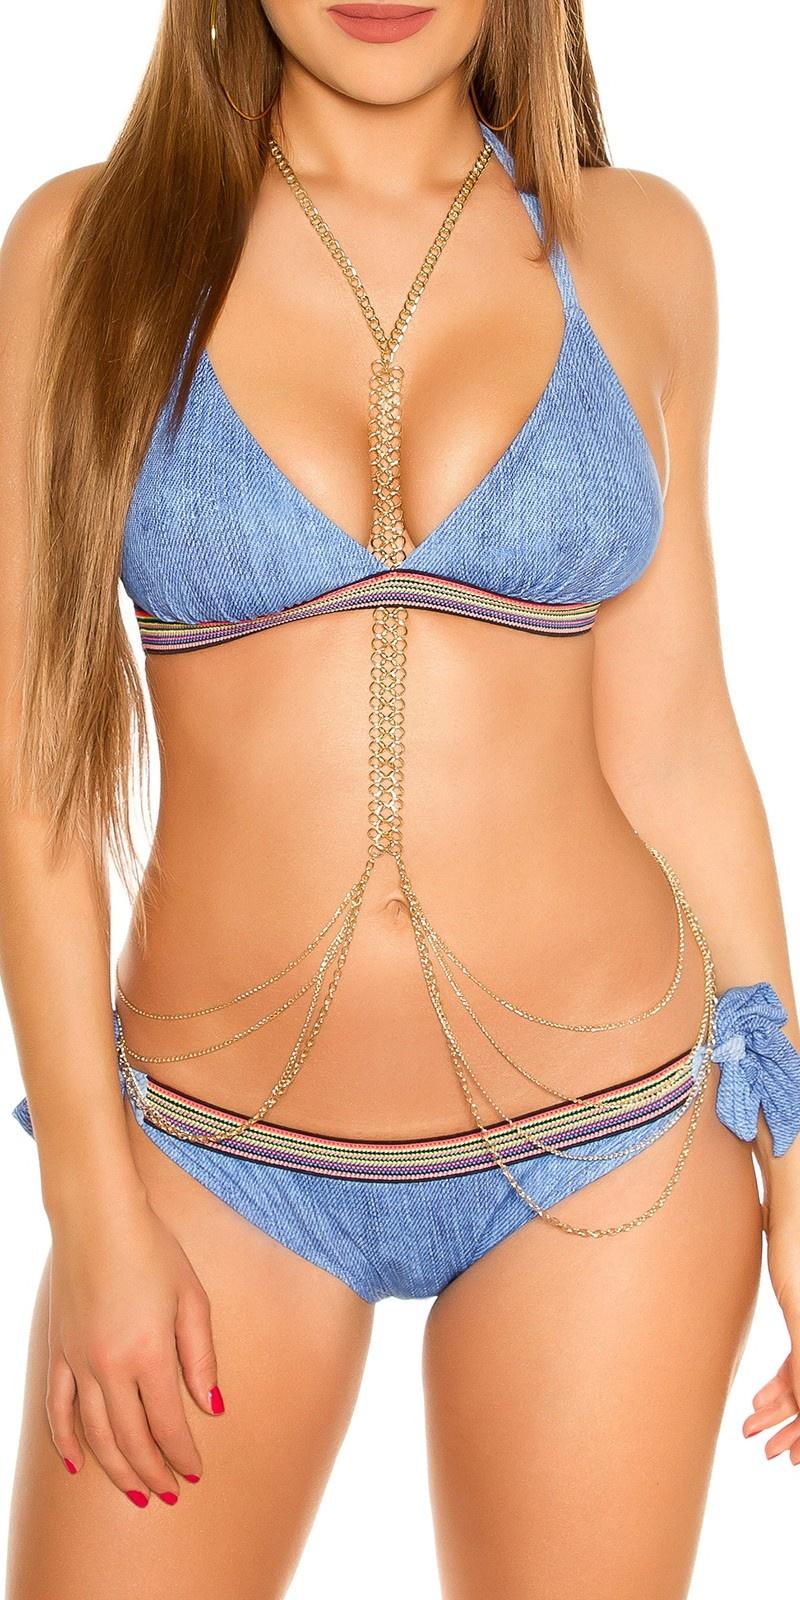 Bikini lichtblauw